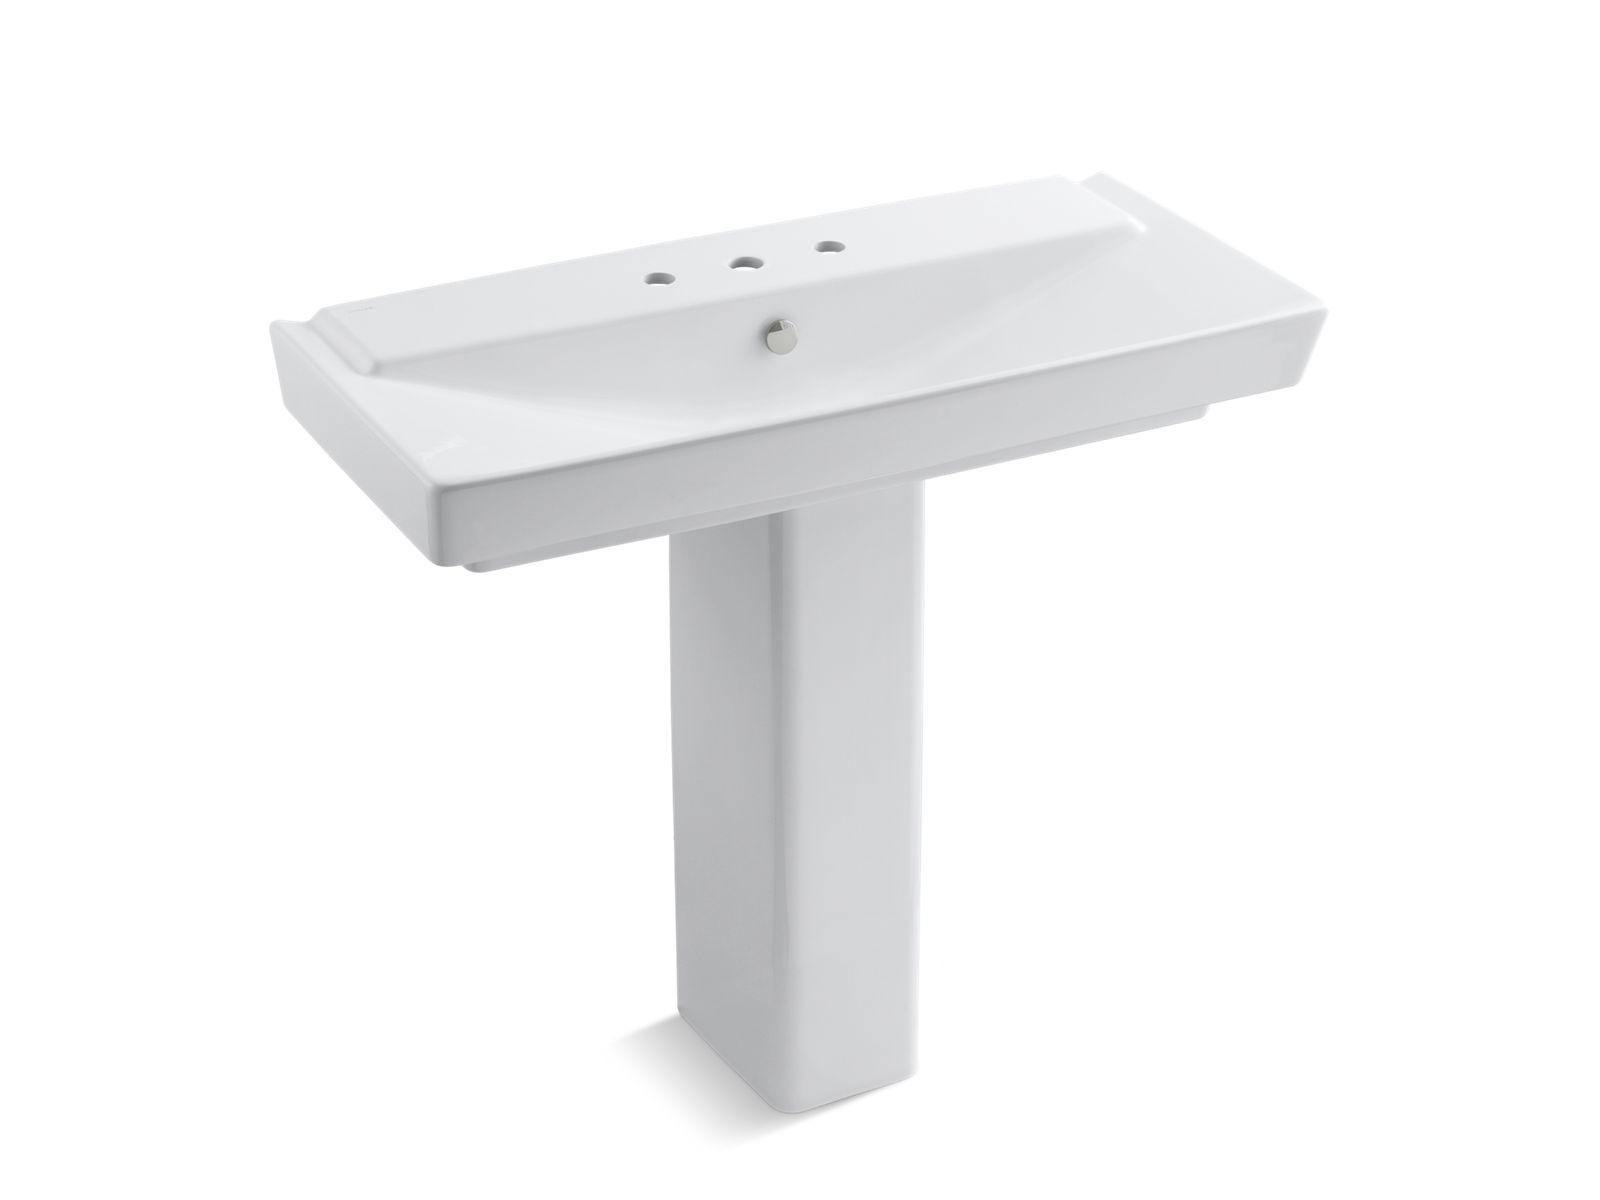 k 5149 8 reve 39 inch sink basin and pedestal with 8 inch centers kohler